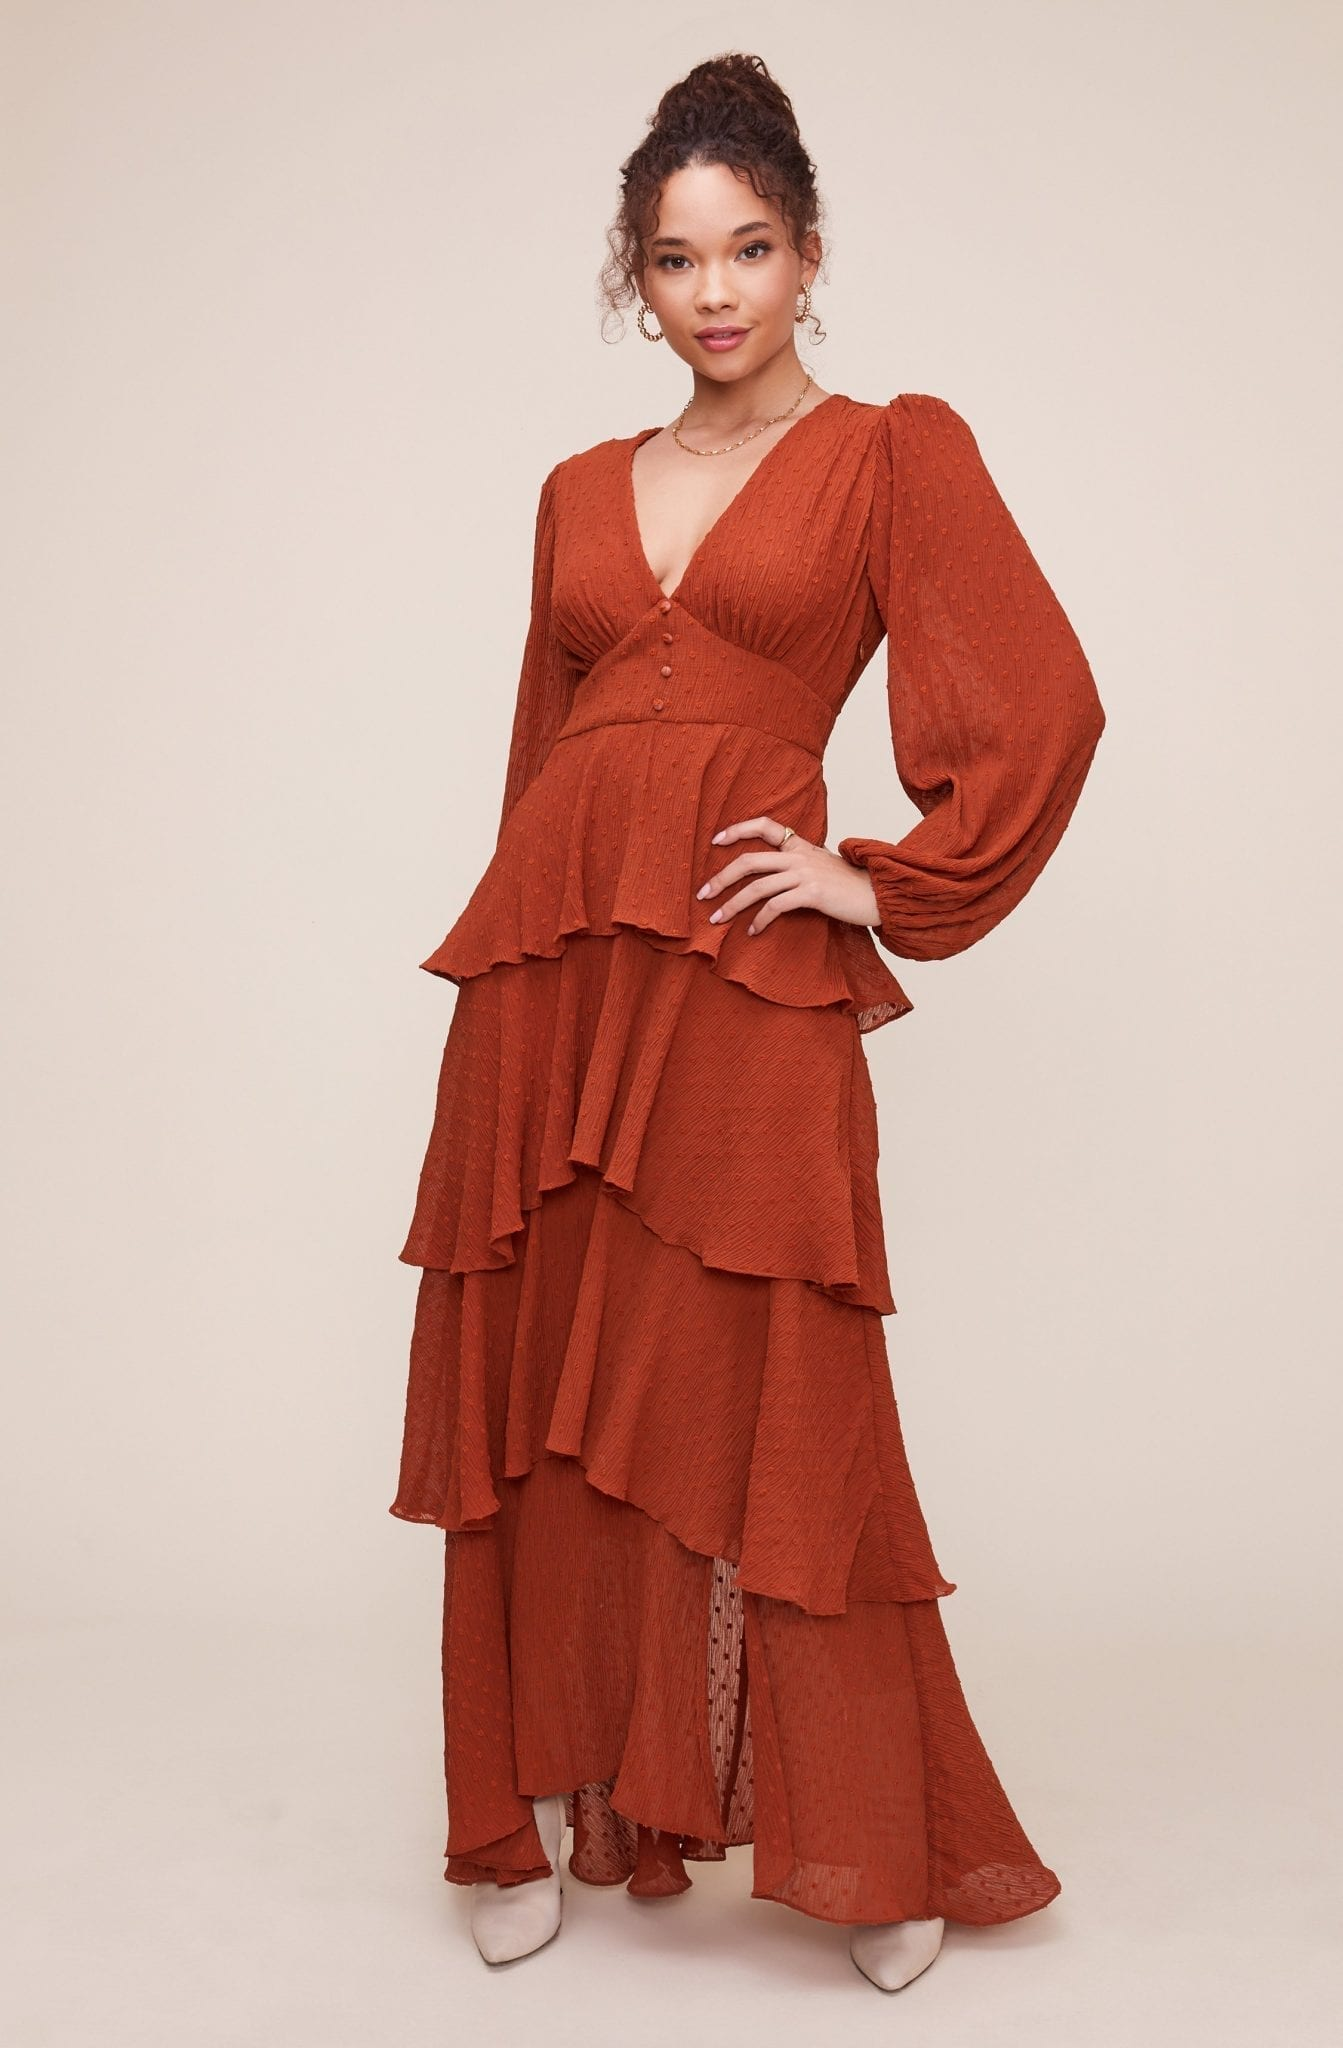 ASTRTHELABEL Romance Me Dress